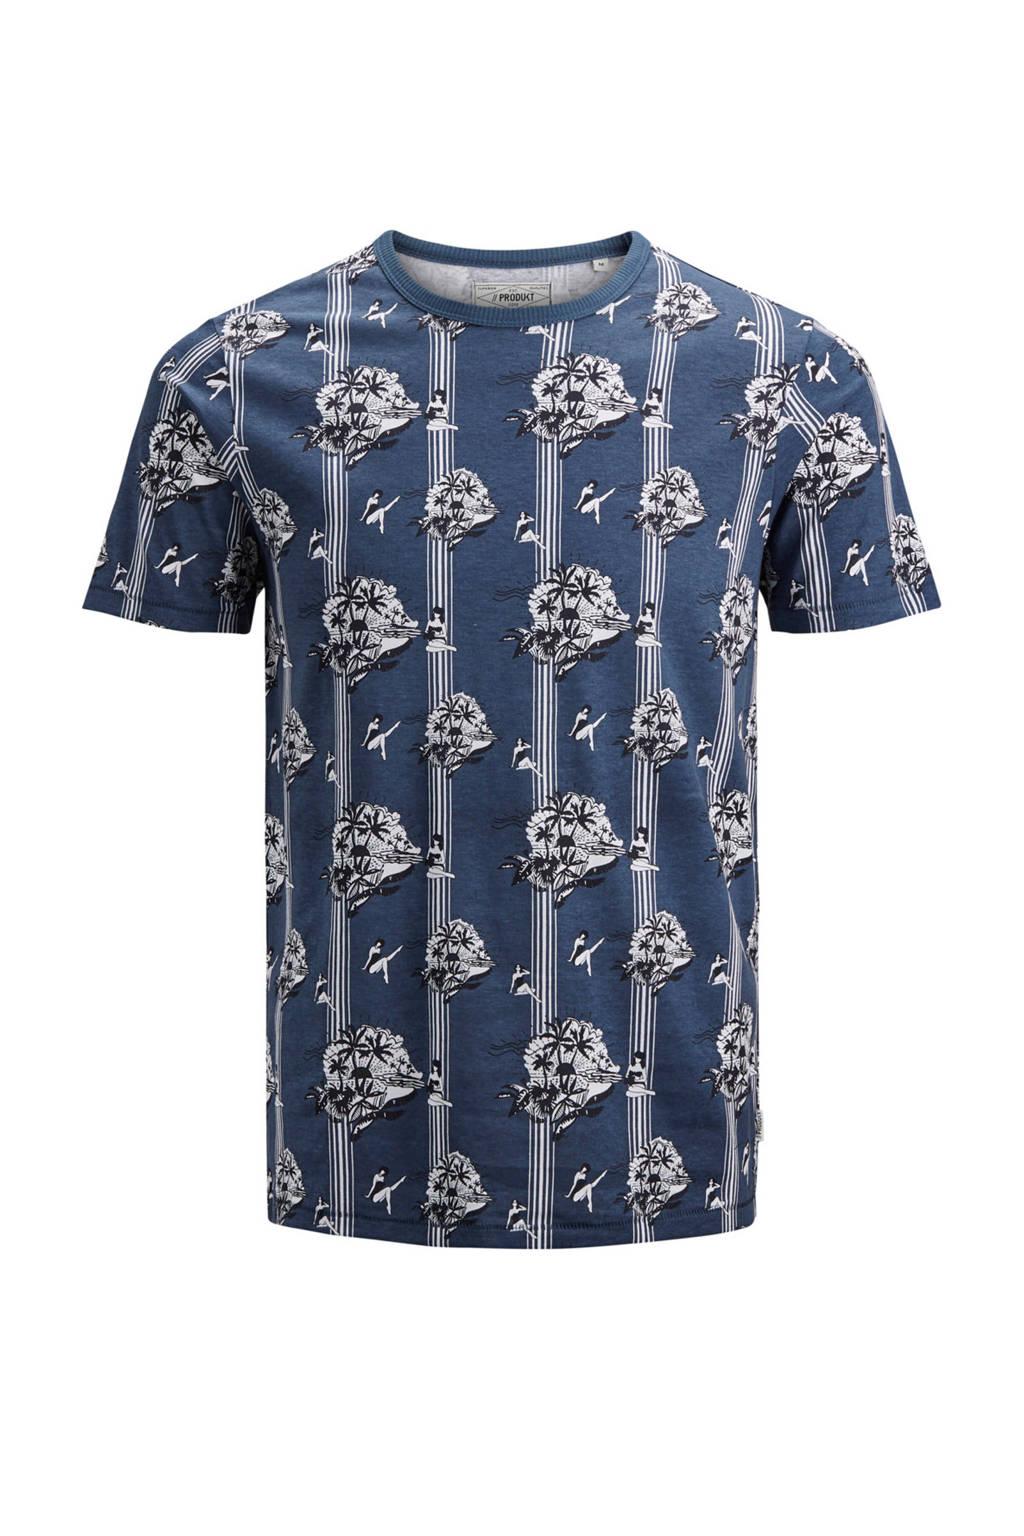 PRODUKT T-shirt met print, Marine/wit